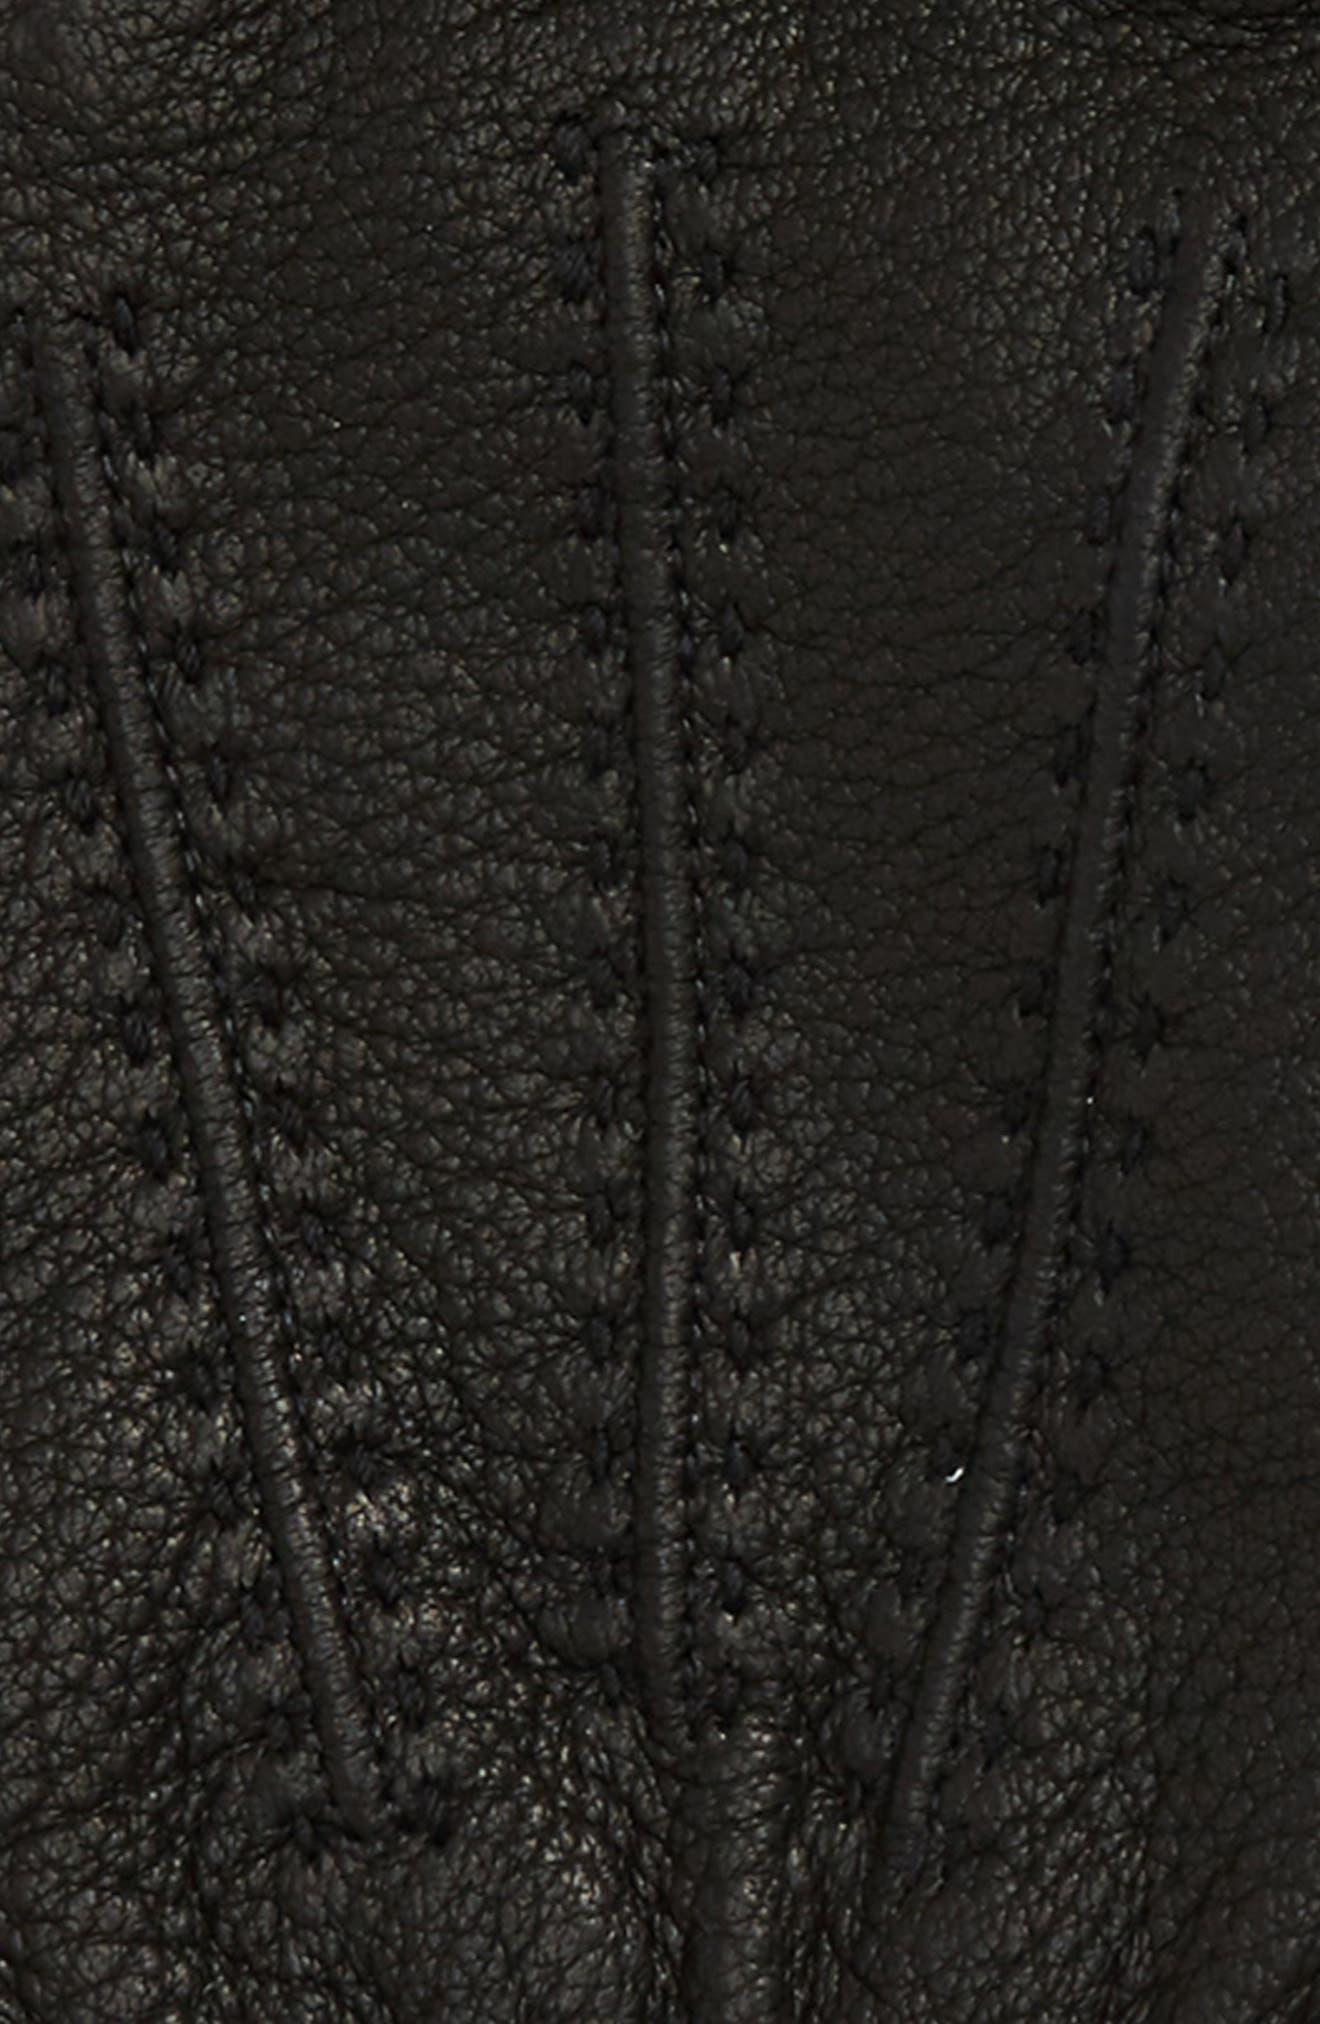 Deerskin Leather Gloves,                             Alternate thumbnail 2, color,                             001